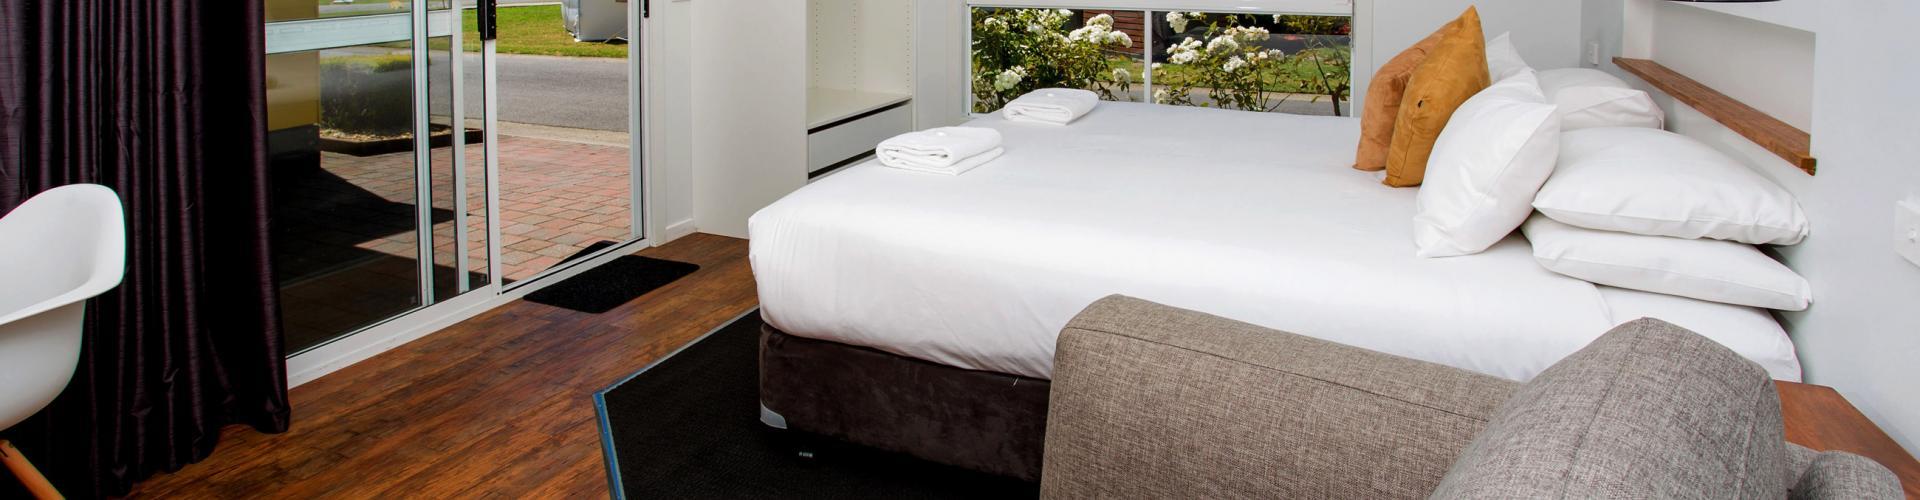 BIG4 Traralgon Park Lane Holiday Park - Studio Cabin - Living Bed